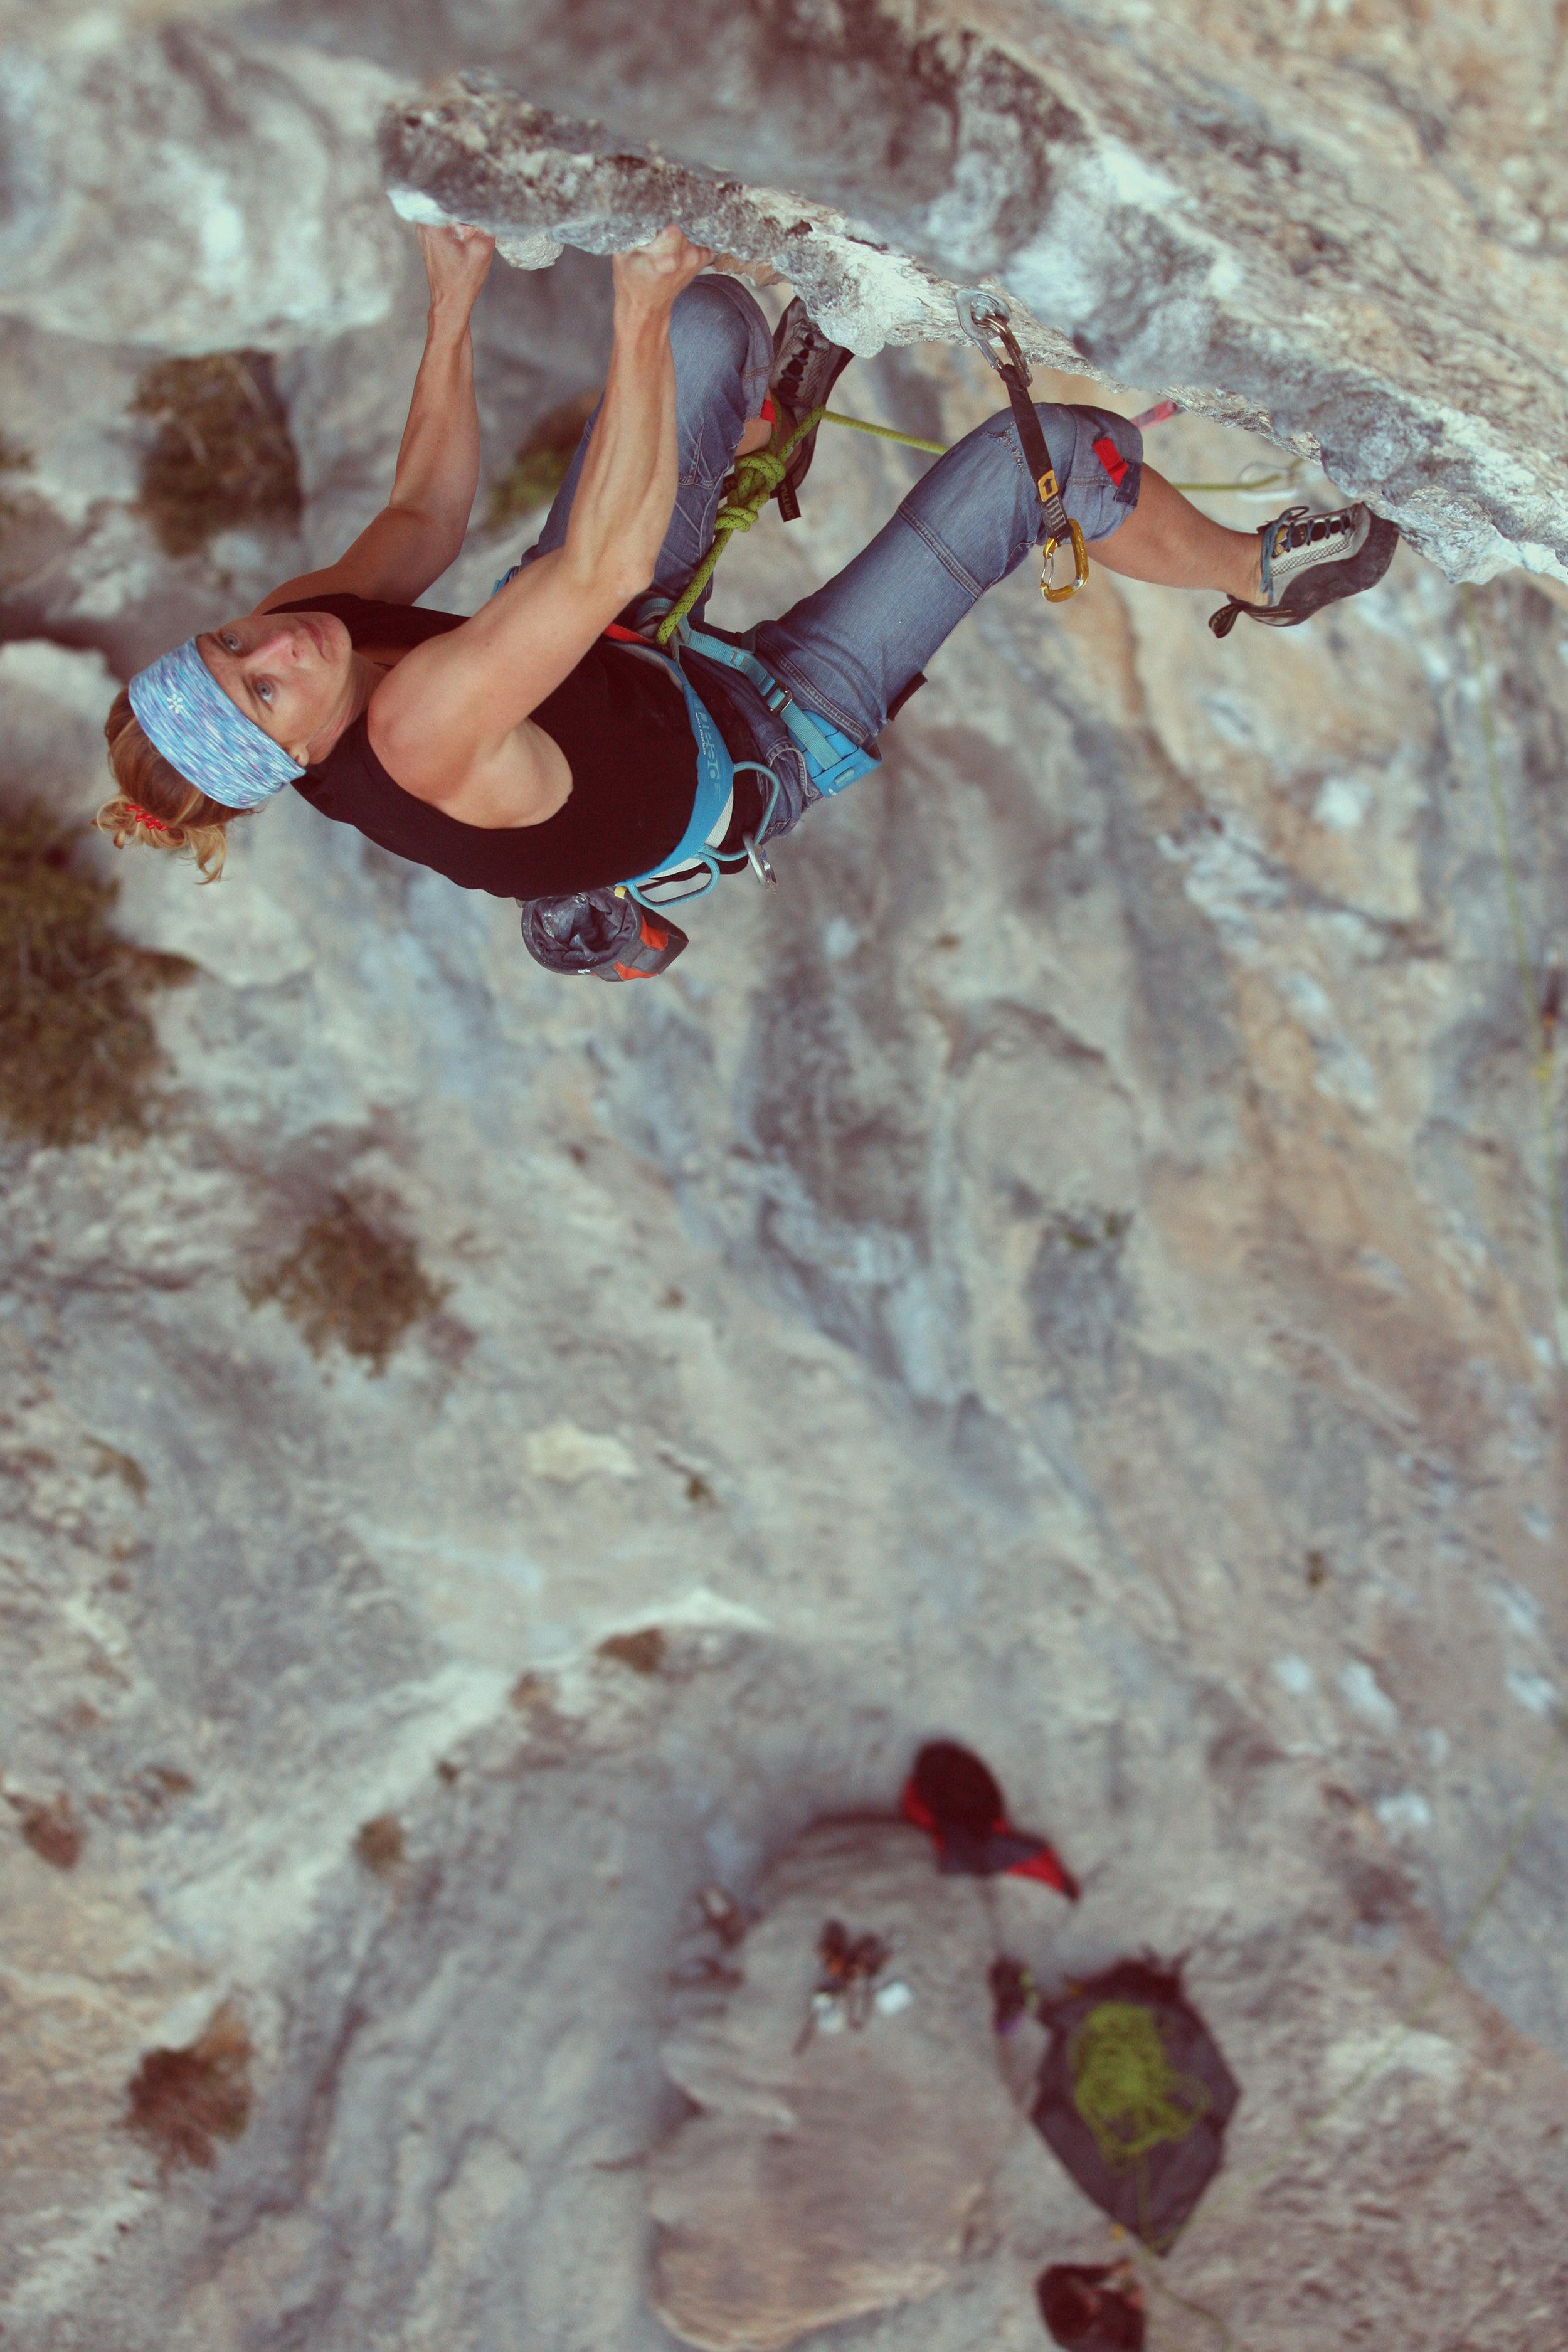 Rockbusters_27crags_climbing_5.jpg